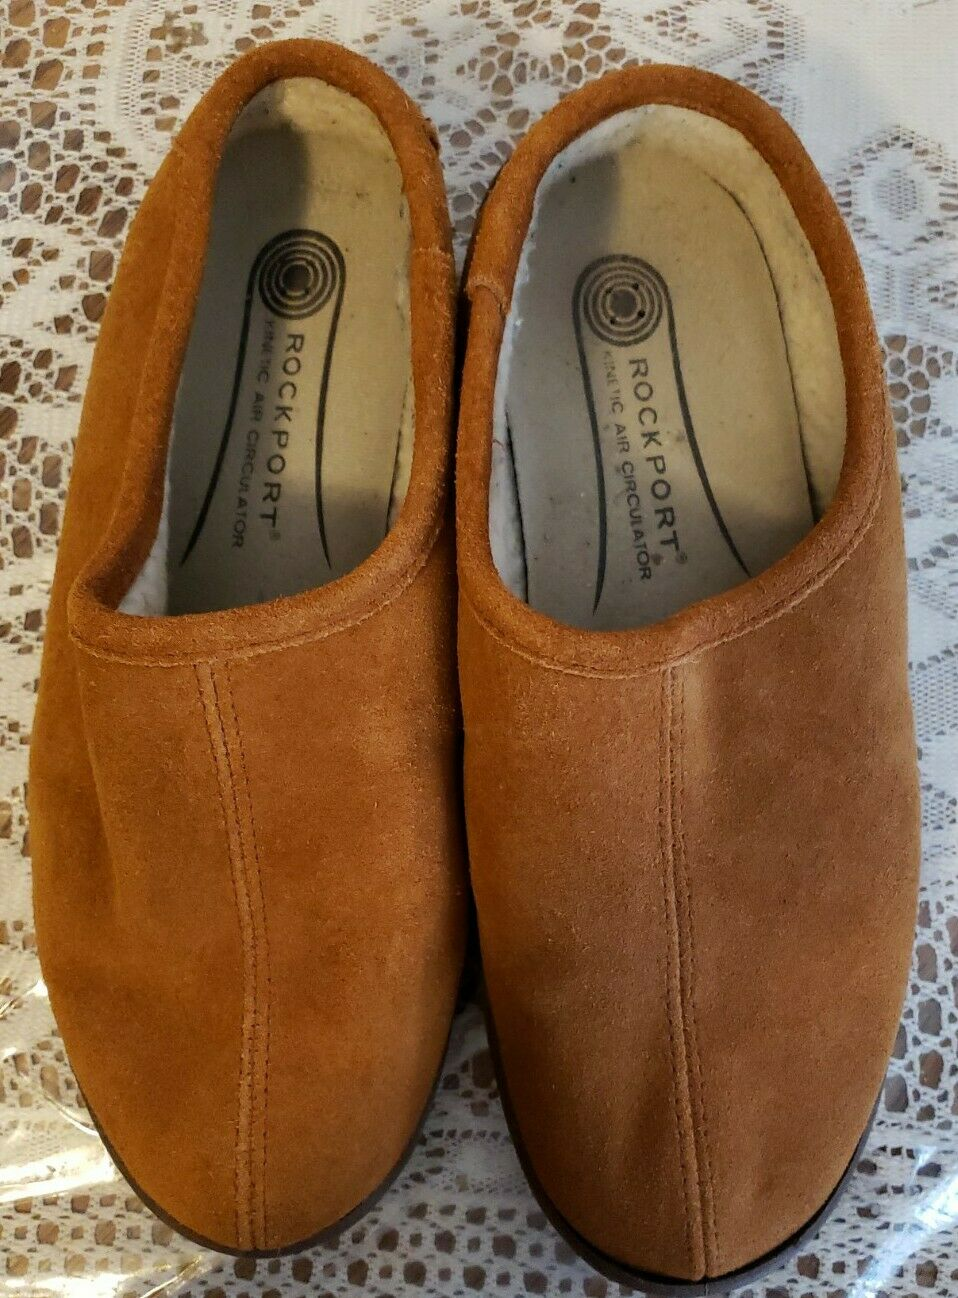 Slipper Shoes 119841 Mens Size 8.5